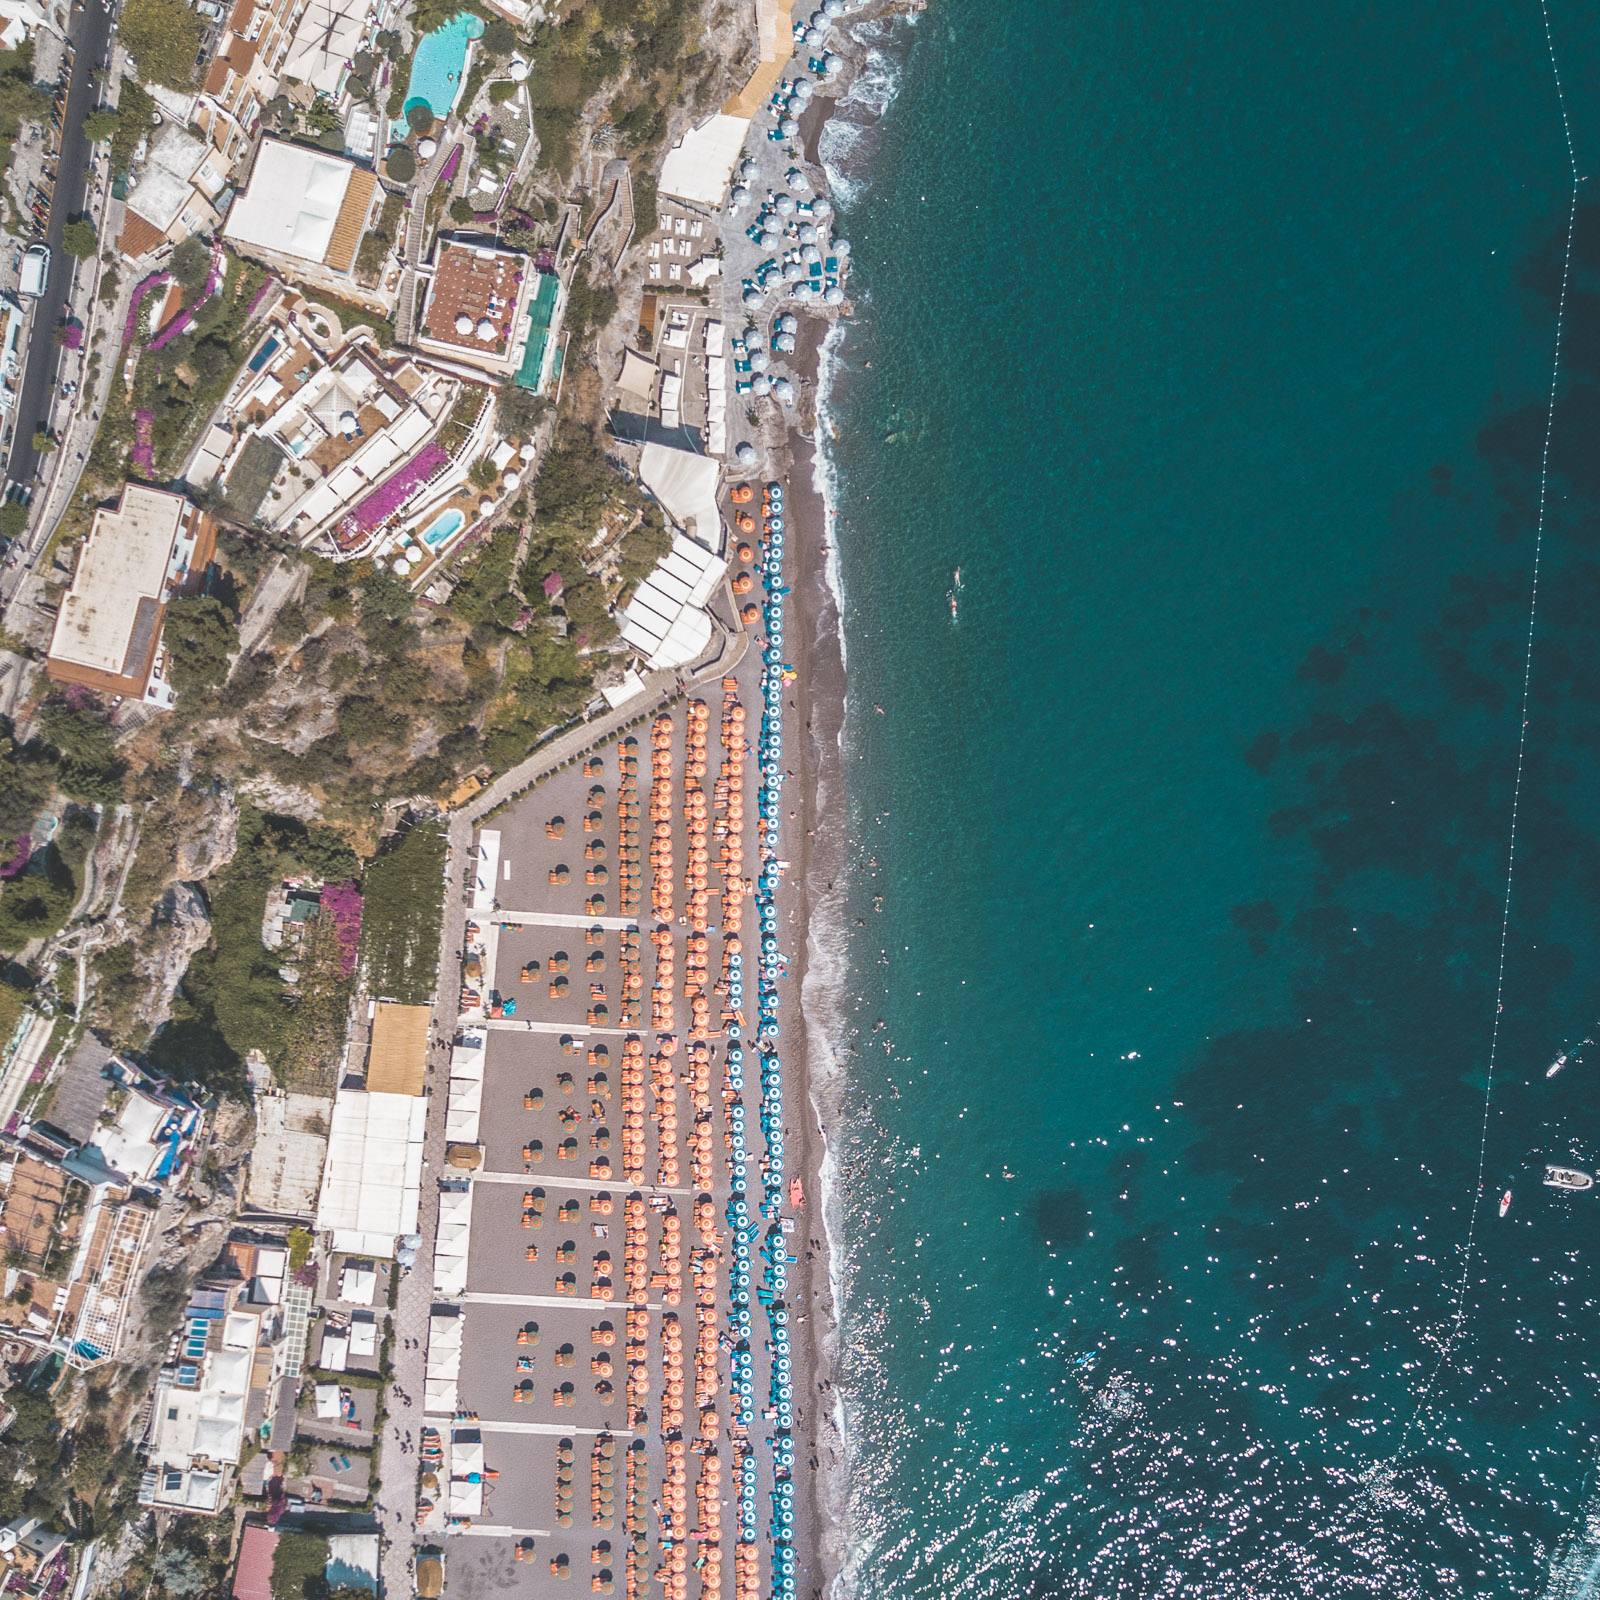 amalfi coast drone positano